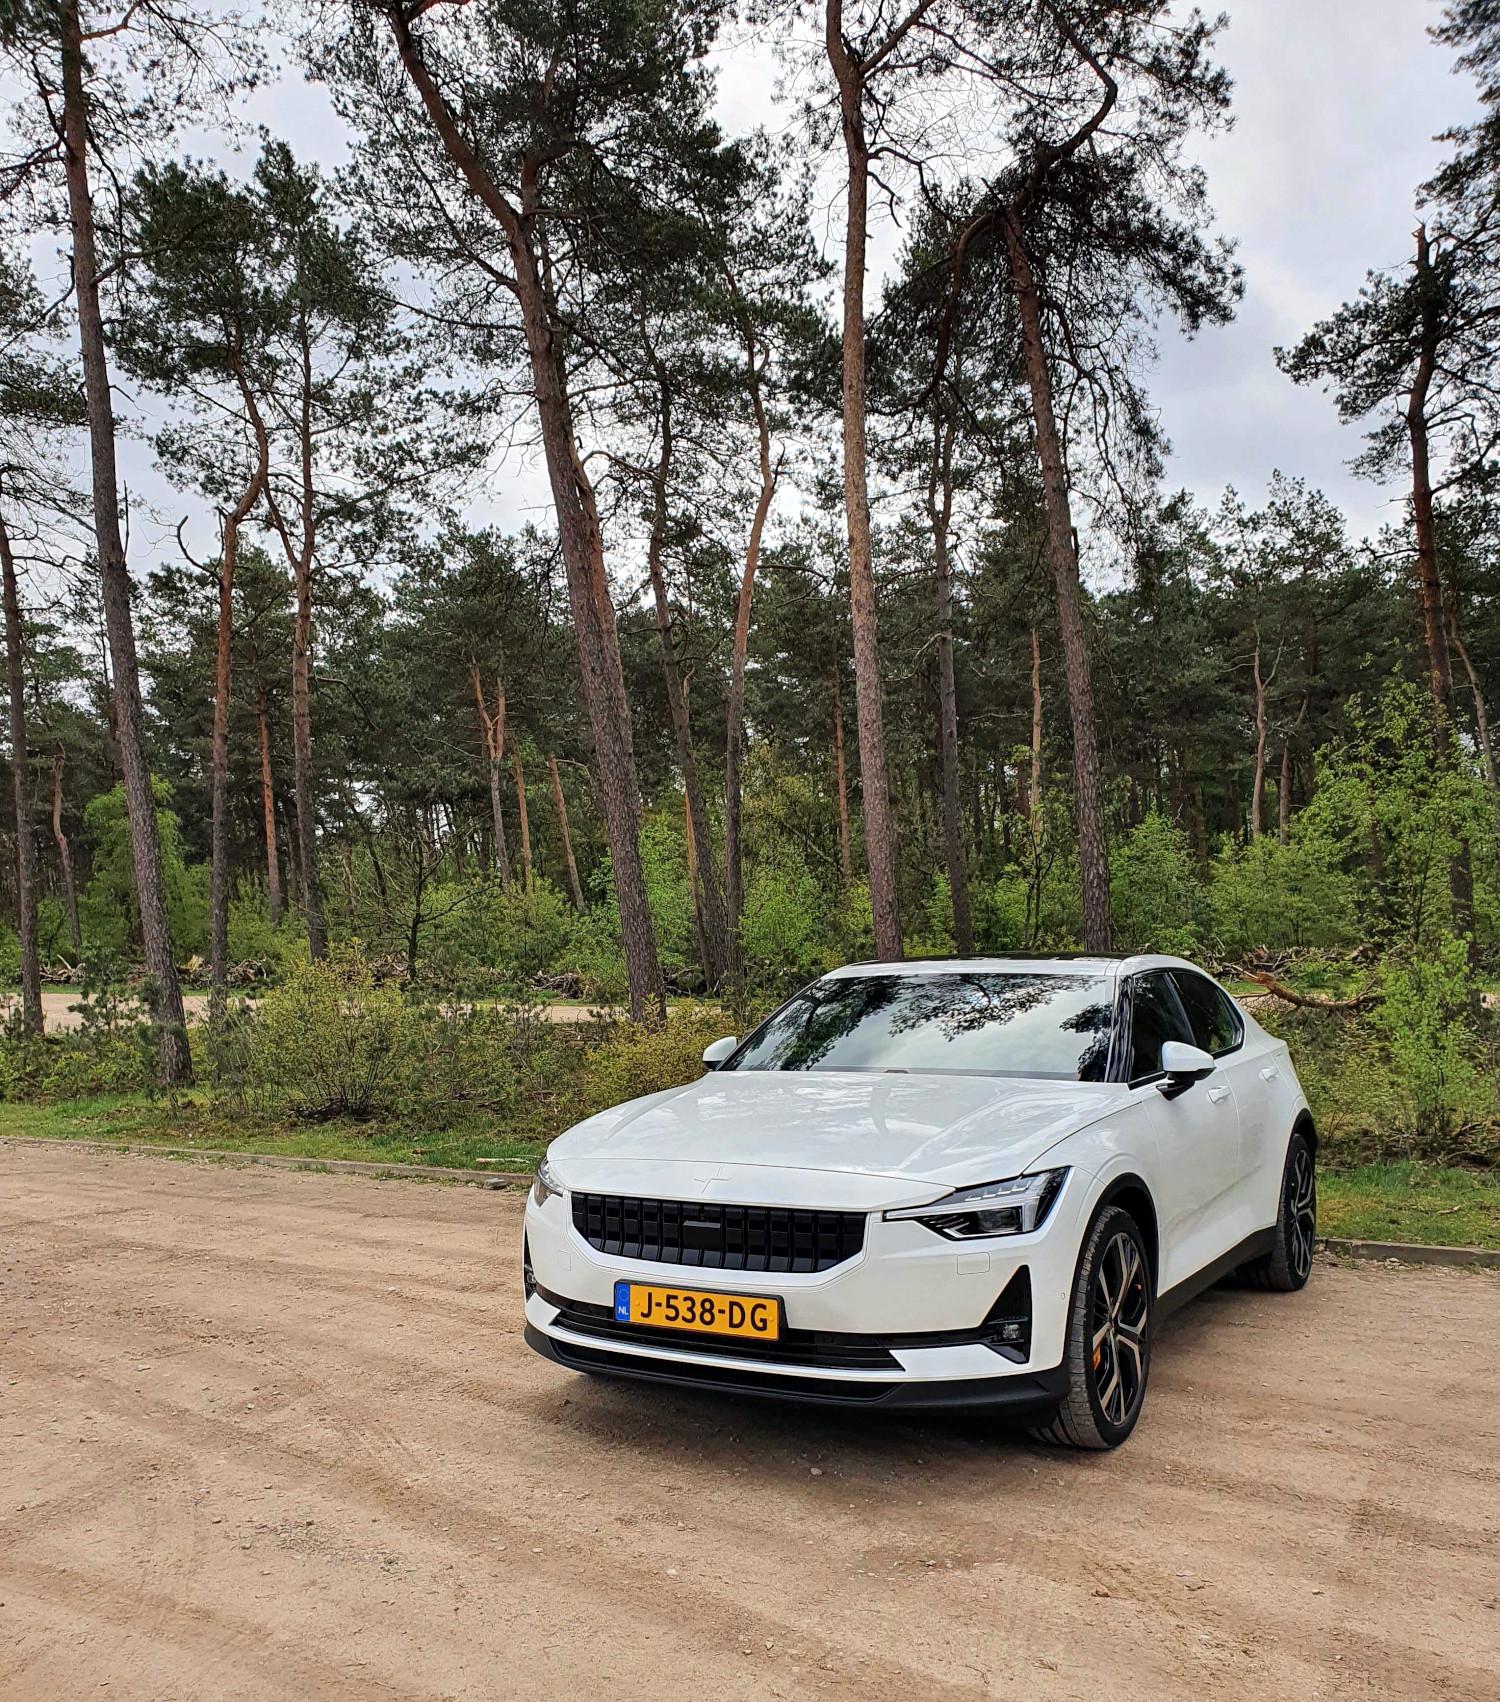 polestar 2, car, ev, future, electric